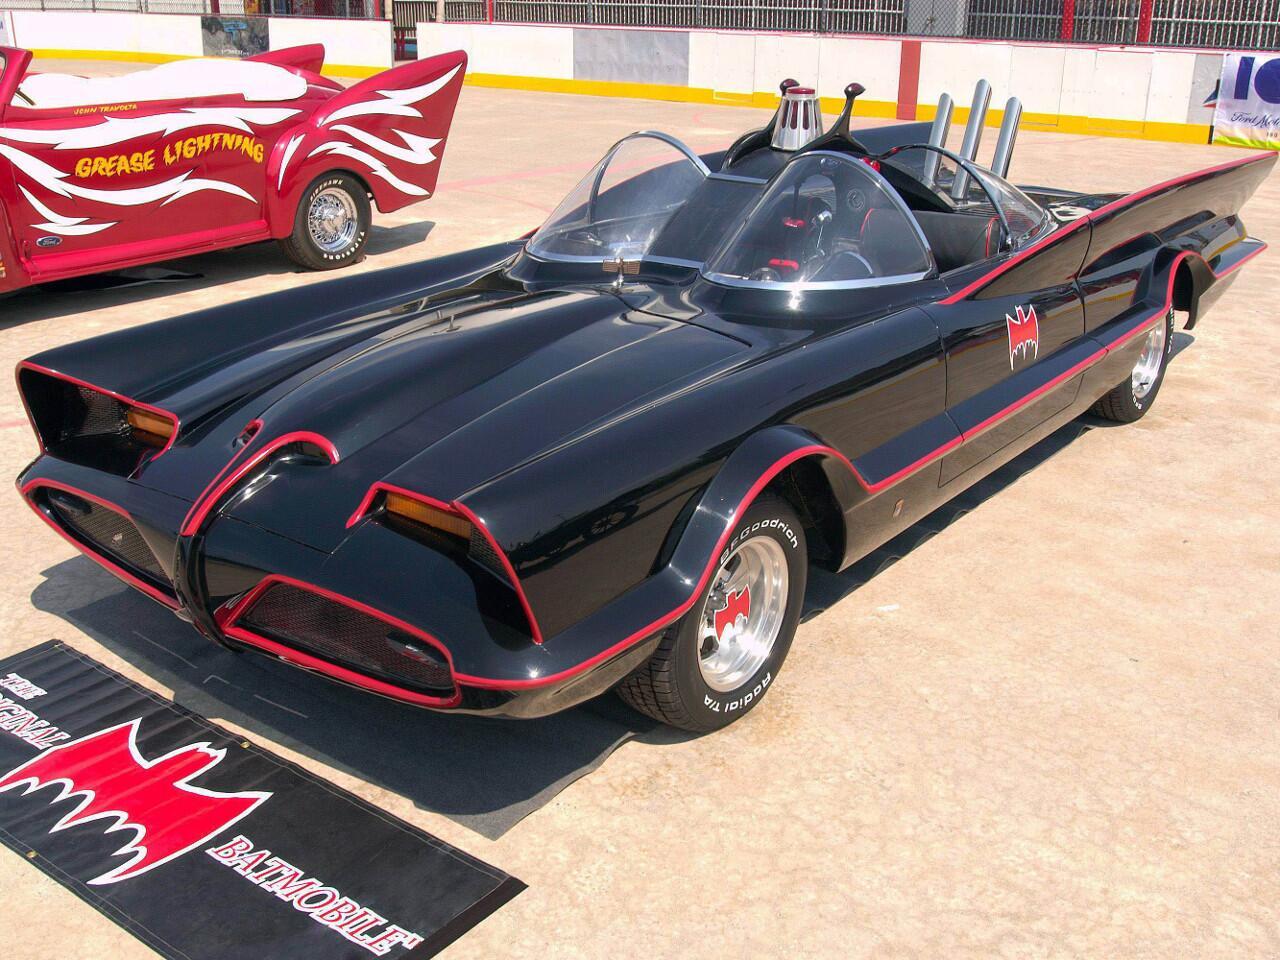 Bild zu Lincoln Futura: Batmobil